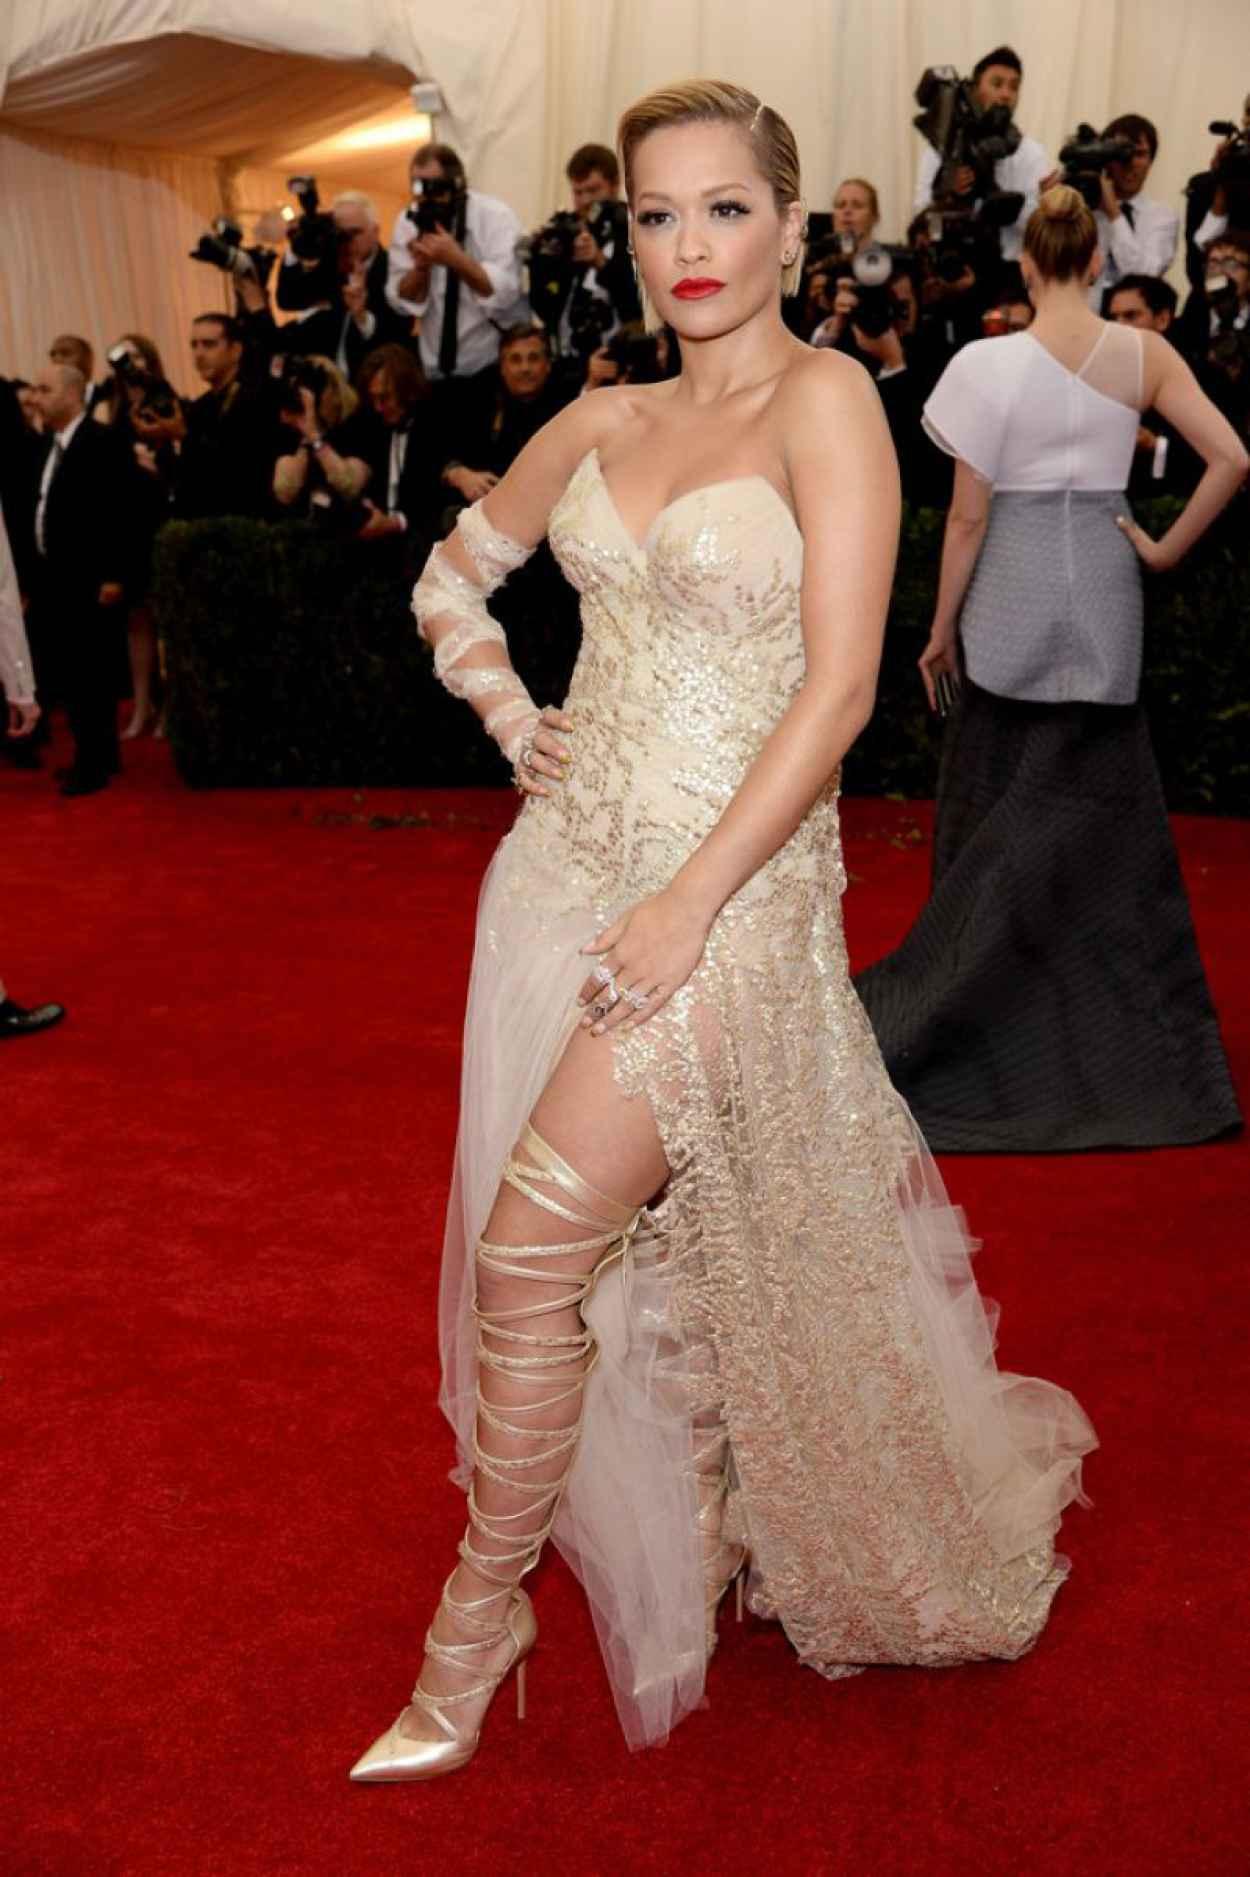 Rita Ora Wearing Donna Karan Atelier Gown - 2015 Met Costume Institute Gala-1